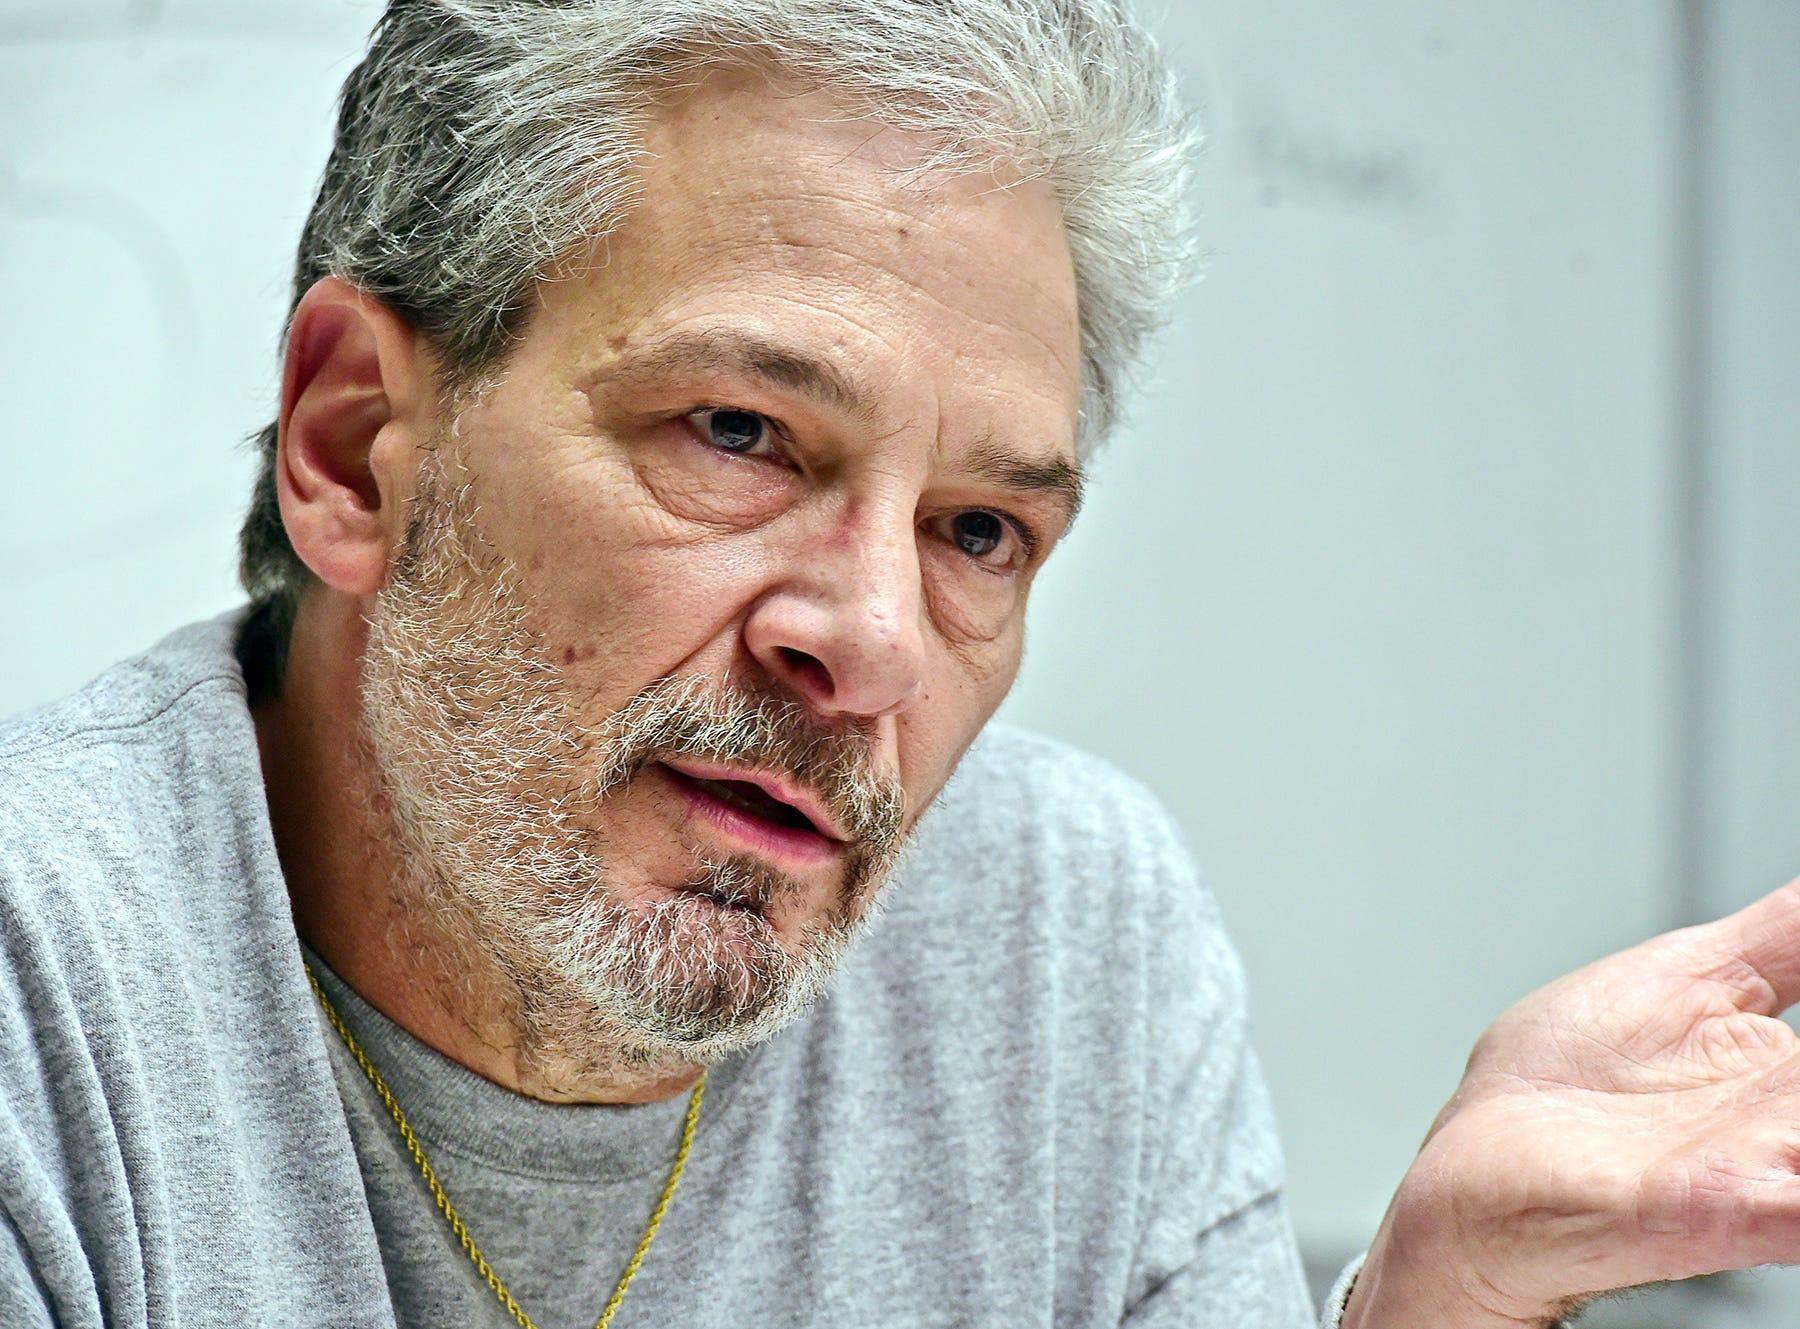 Ralph DeRigo of Binghamton discusses his late son Aaron  DeRigo, who died of an overdose in January 2014.  December 4, 2018.